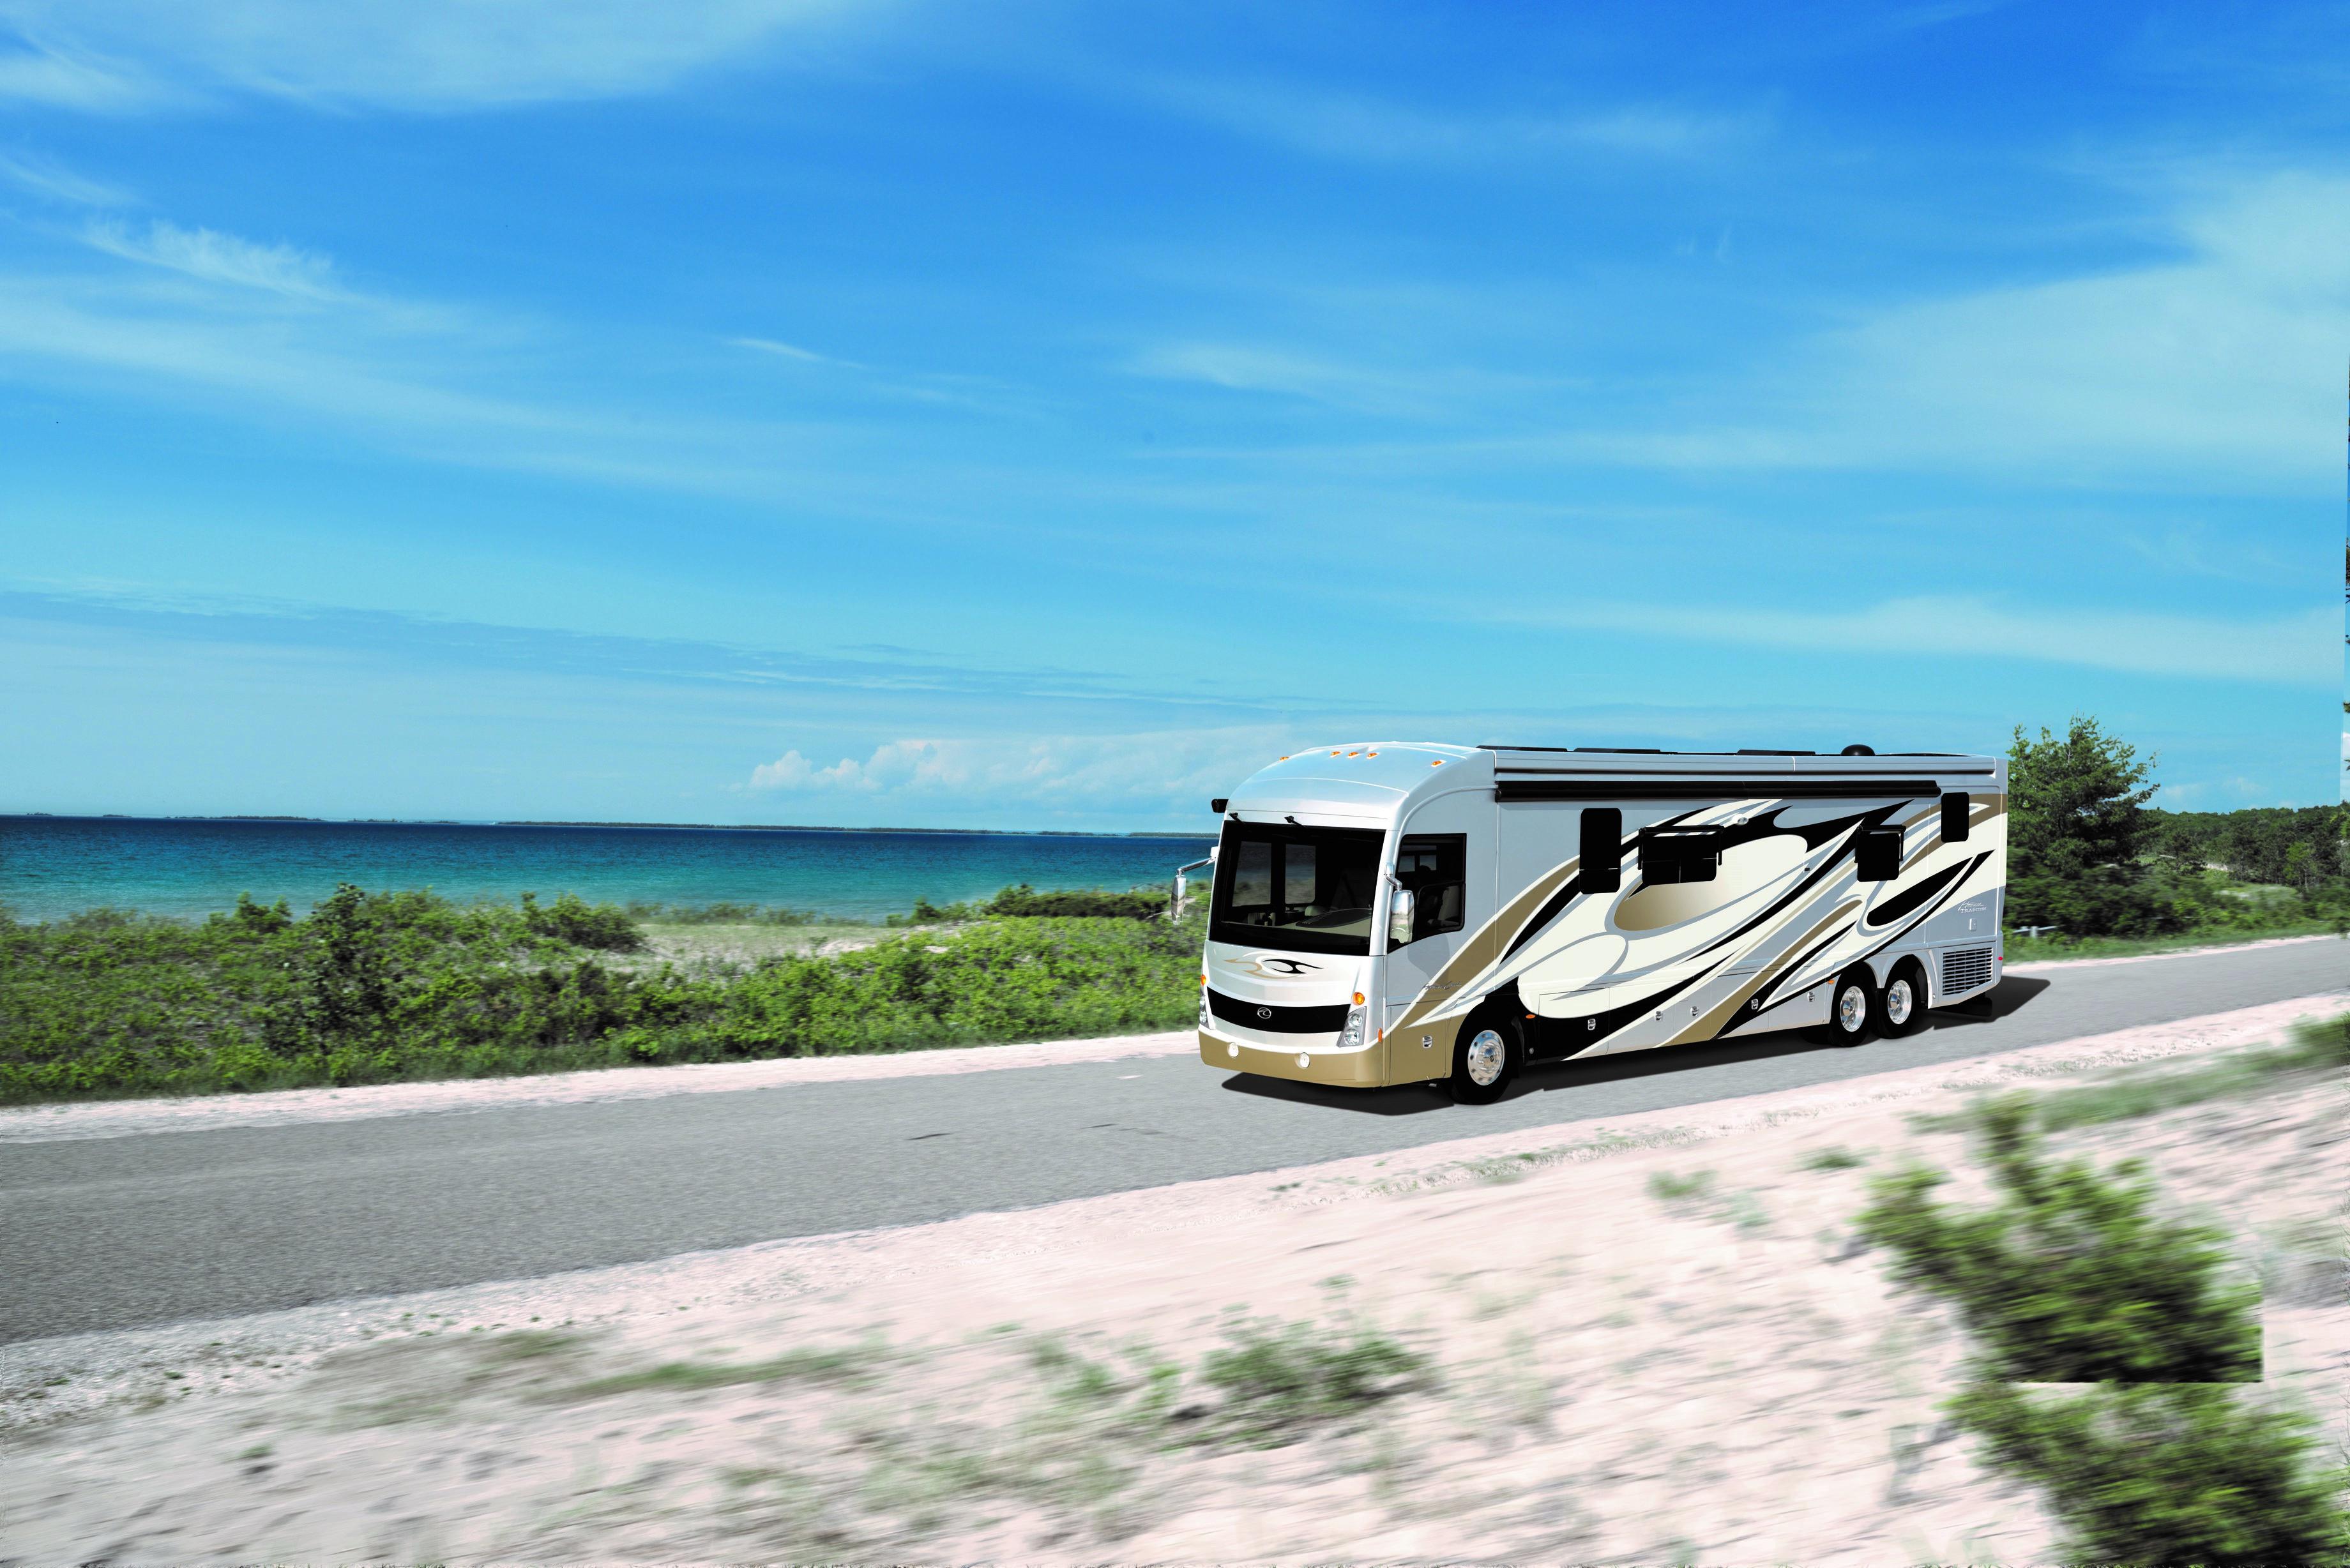 RV road trip to Key West